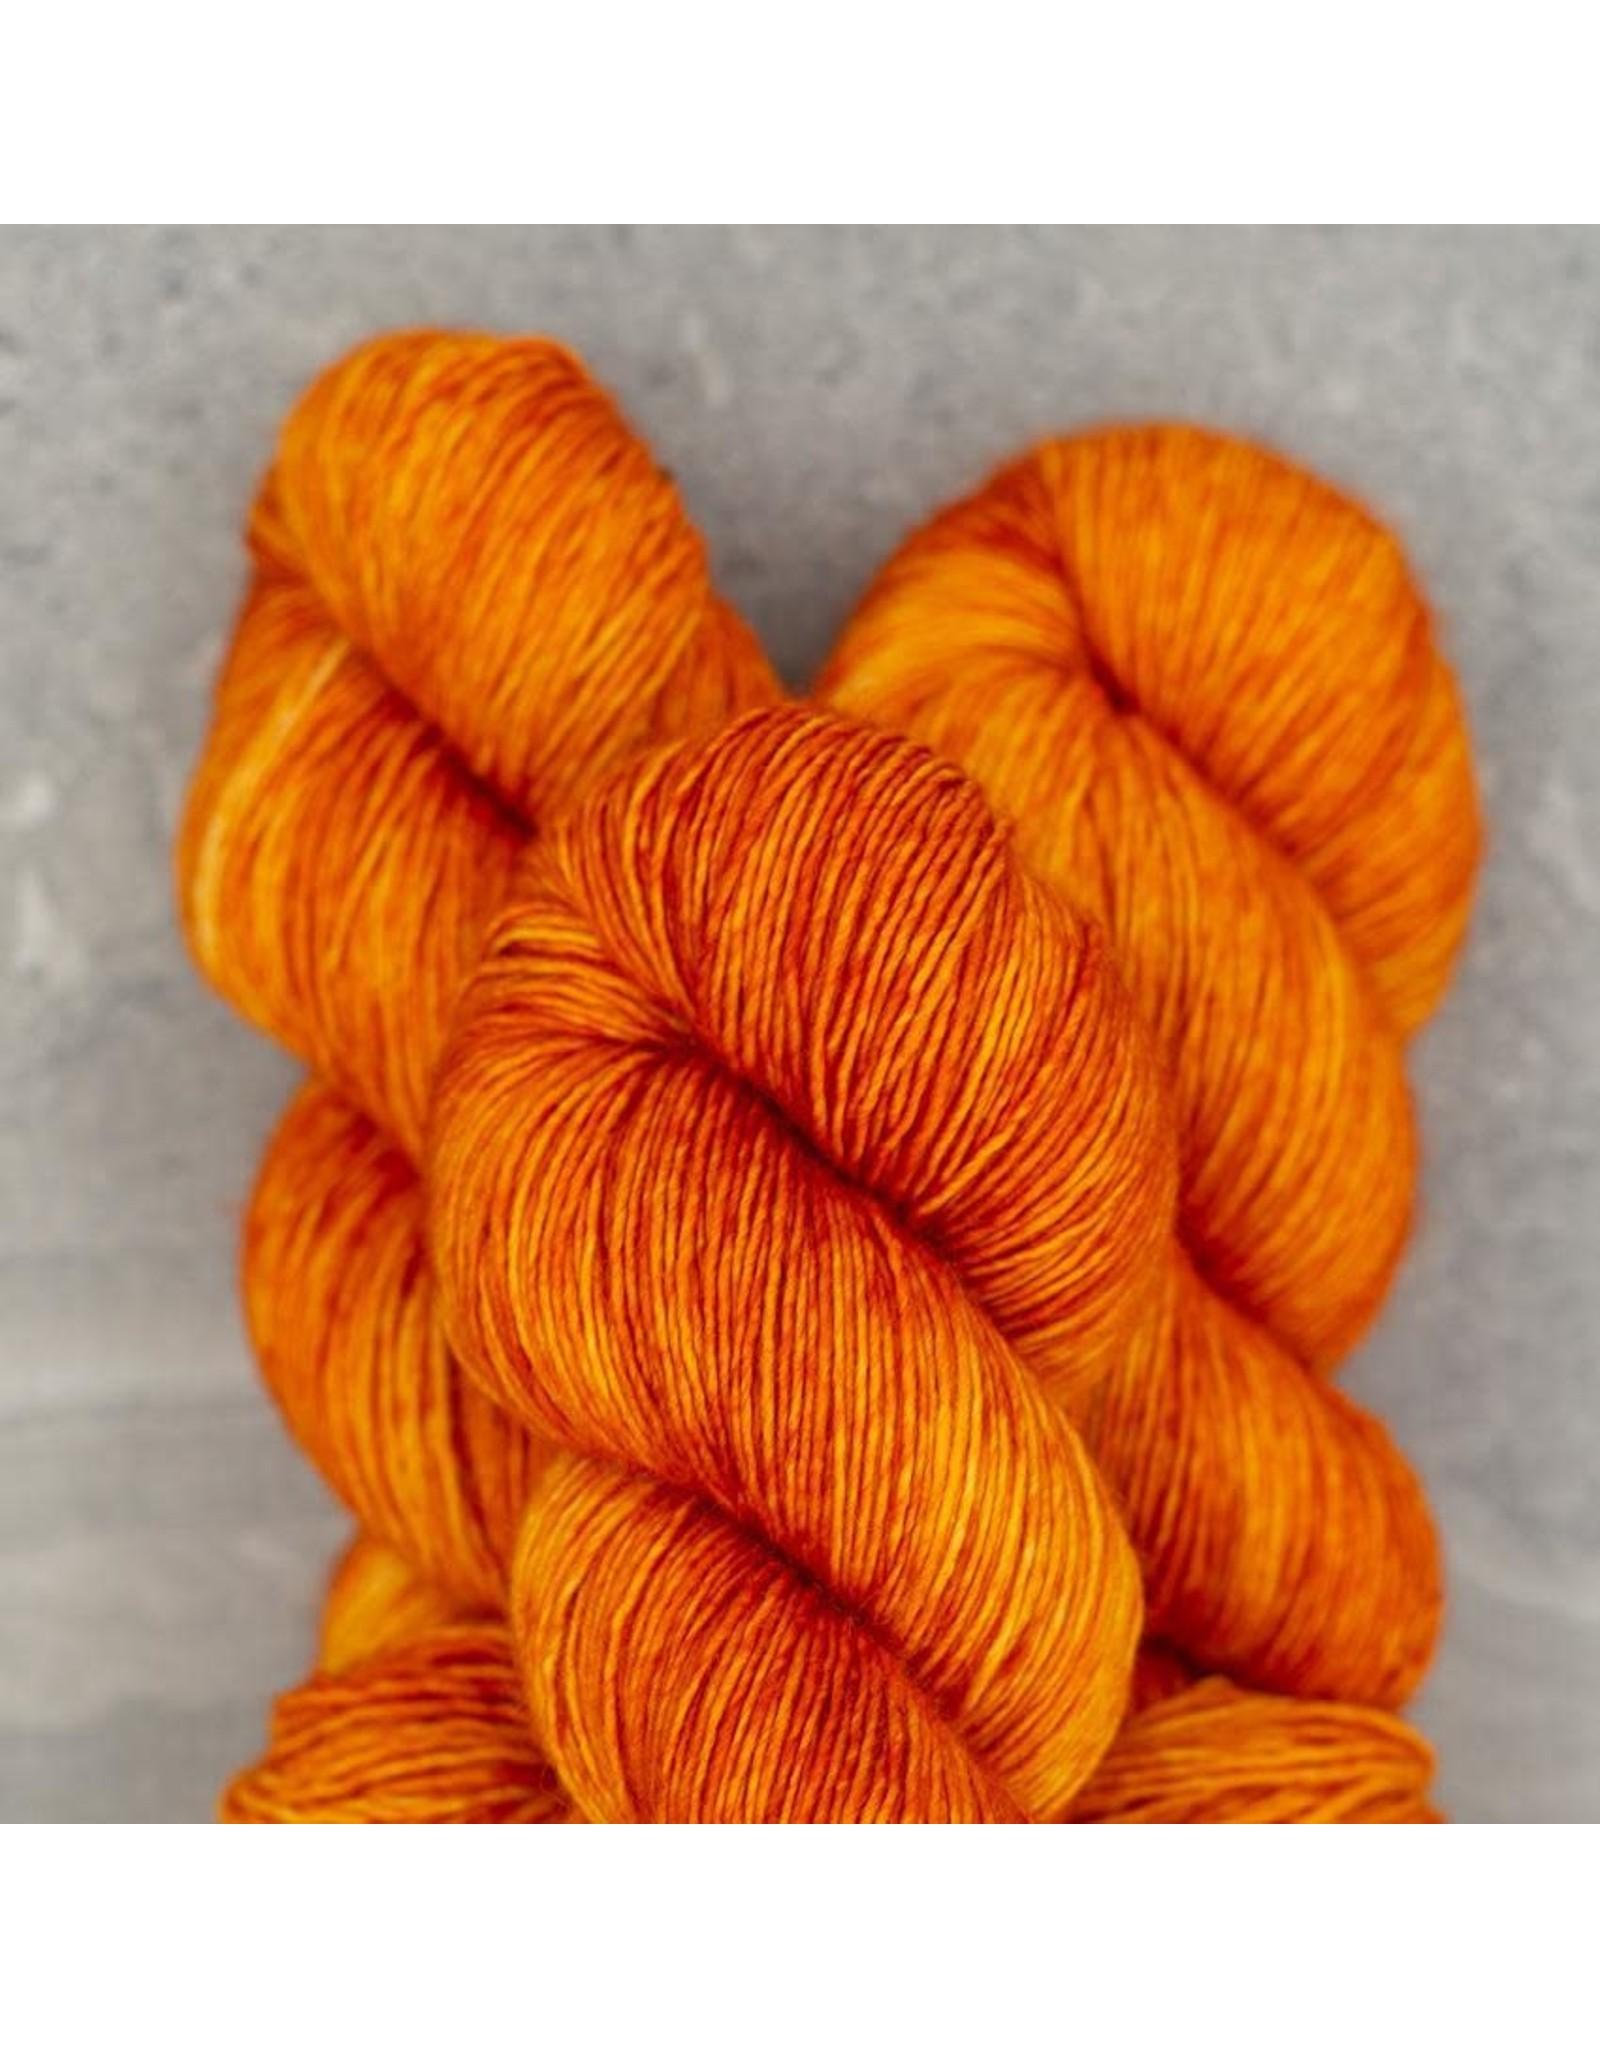 Citrus - Tosh Merino Light - Madelinetosh